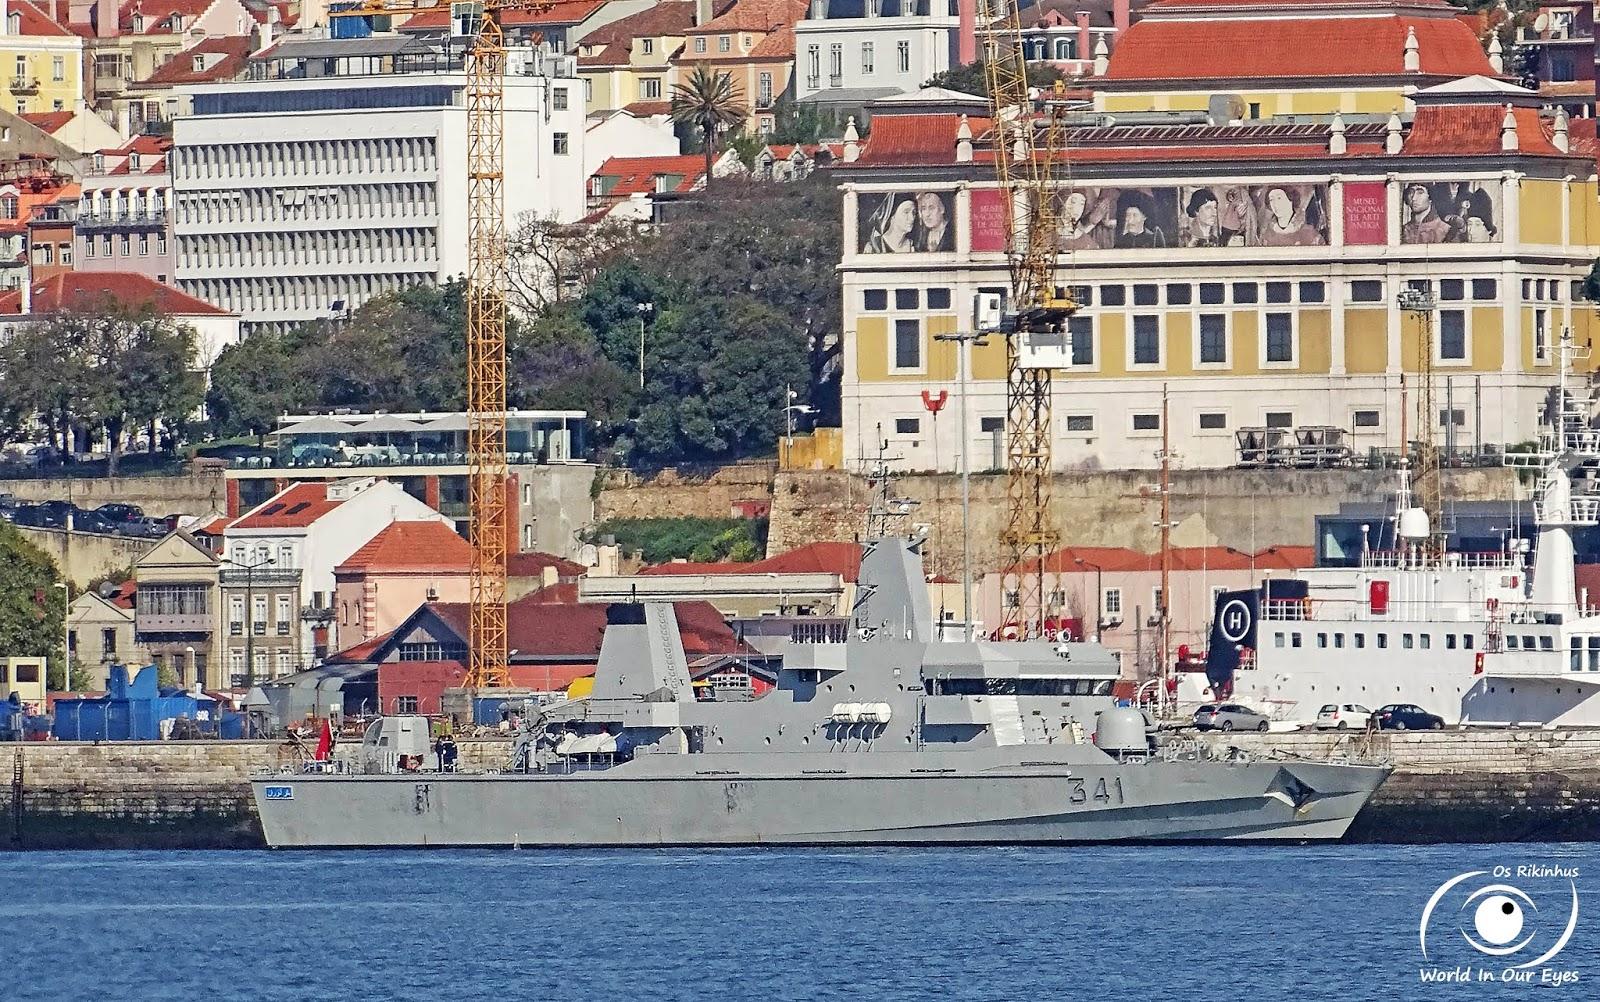 Royal Moroccan Navy OPV-70 / Classe Bir Anzarane - Page 5 DSC00205%2BPatrulha%2BBir%2BAnzarane%2B%2528Marrocos%2529